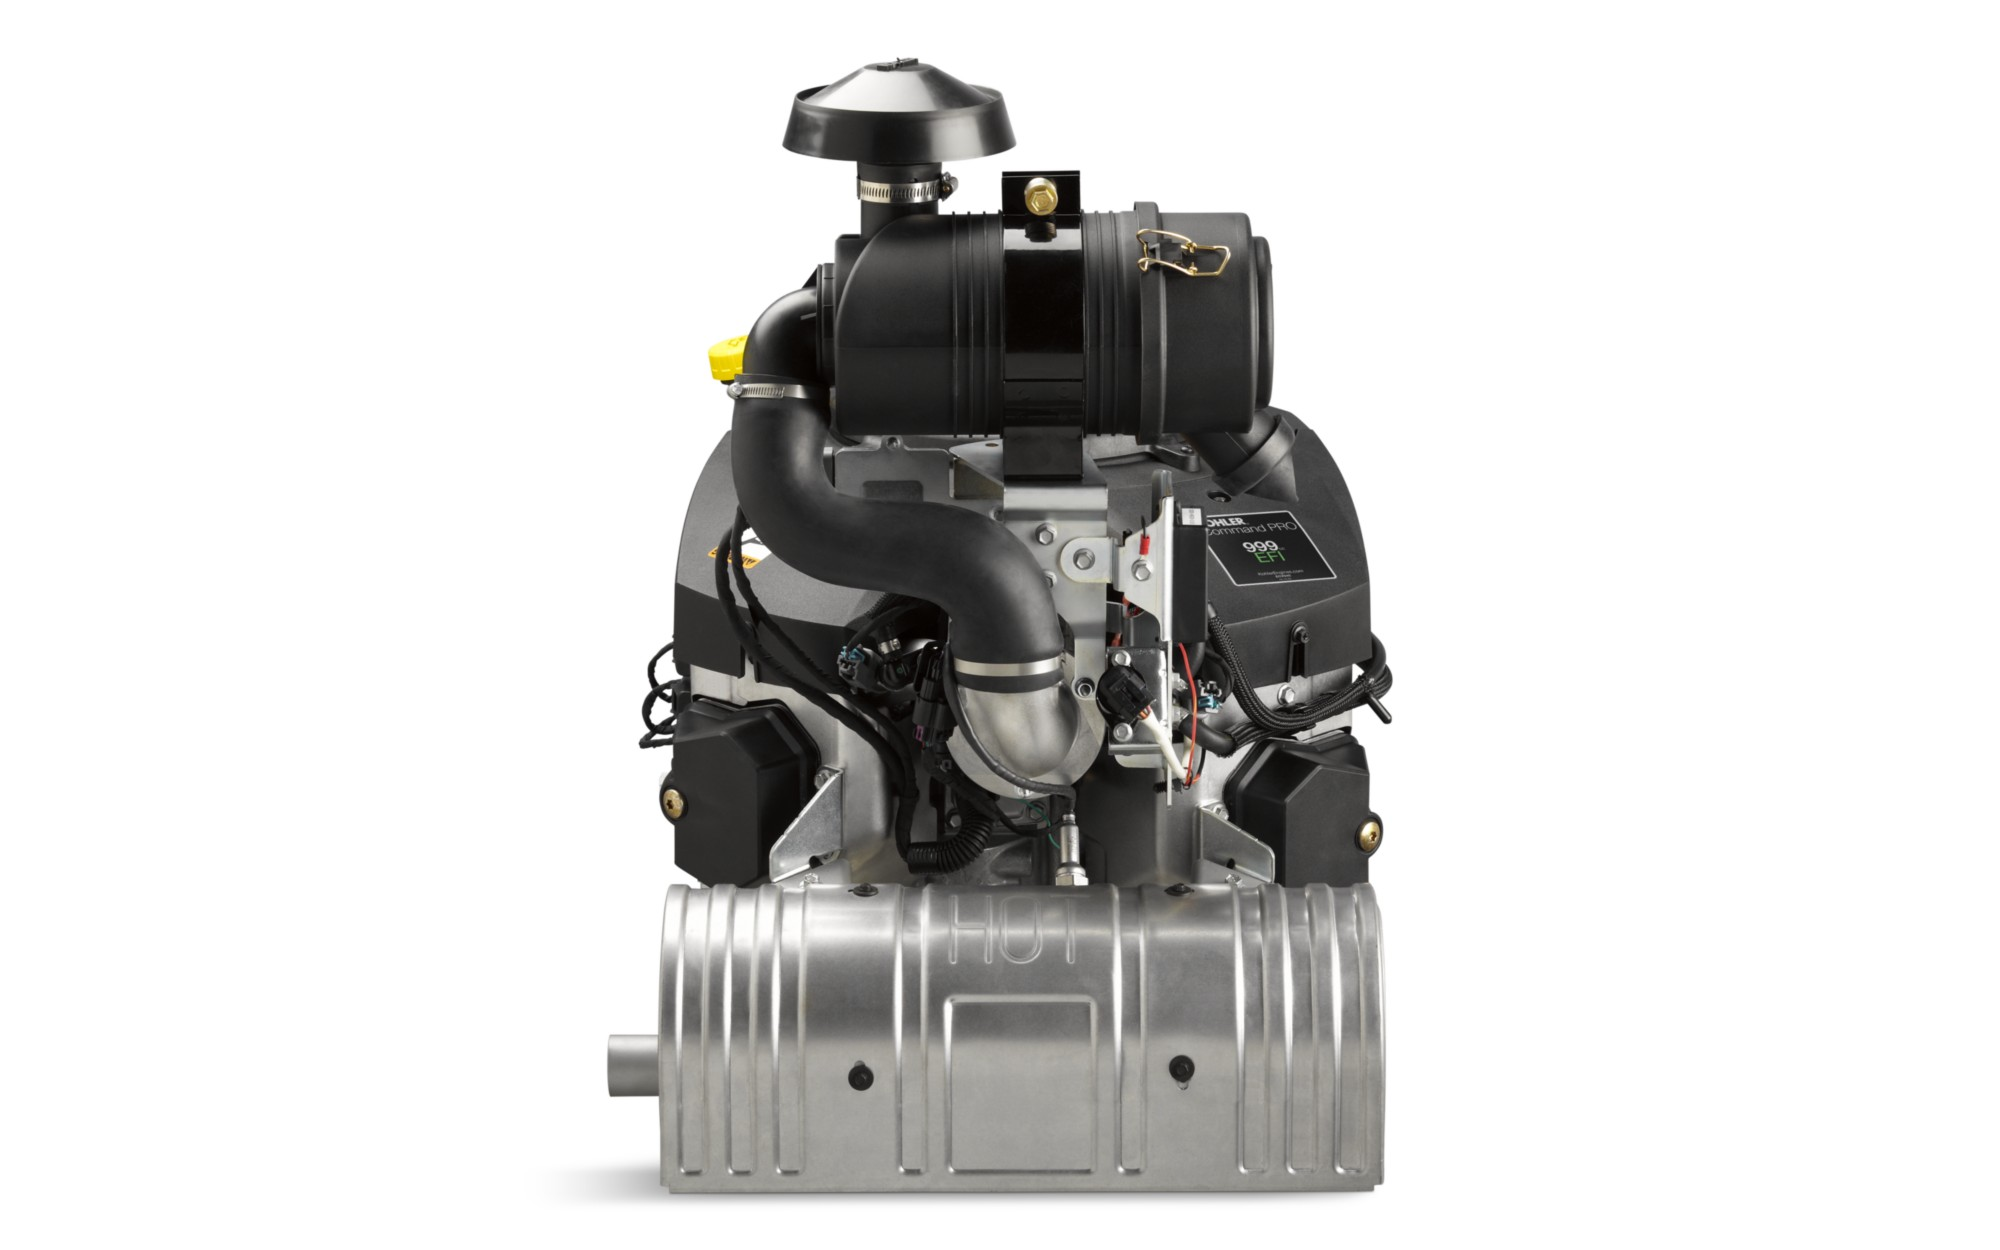 kohler engine charging system diagram yamaha xs650 wiring ch18